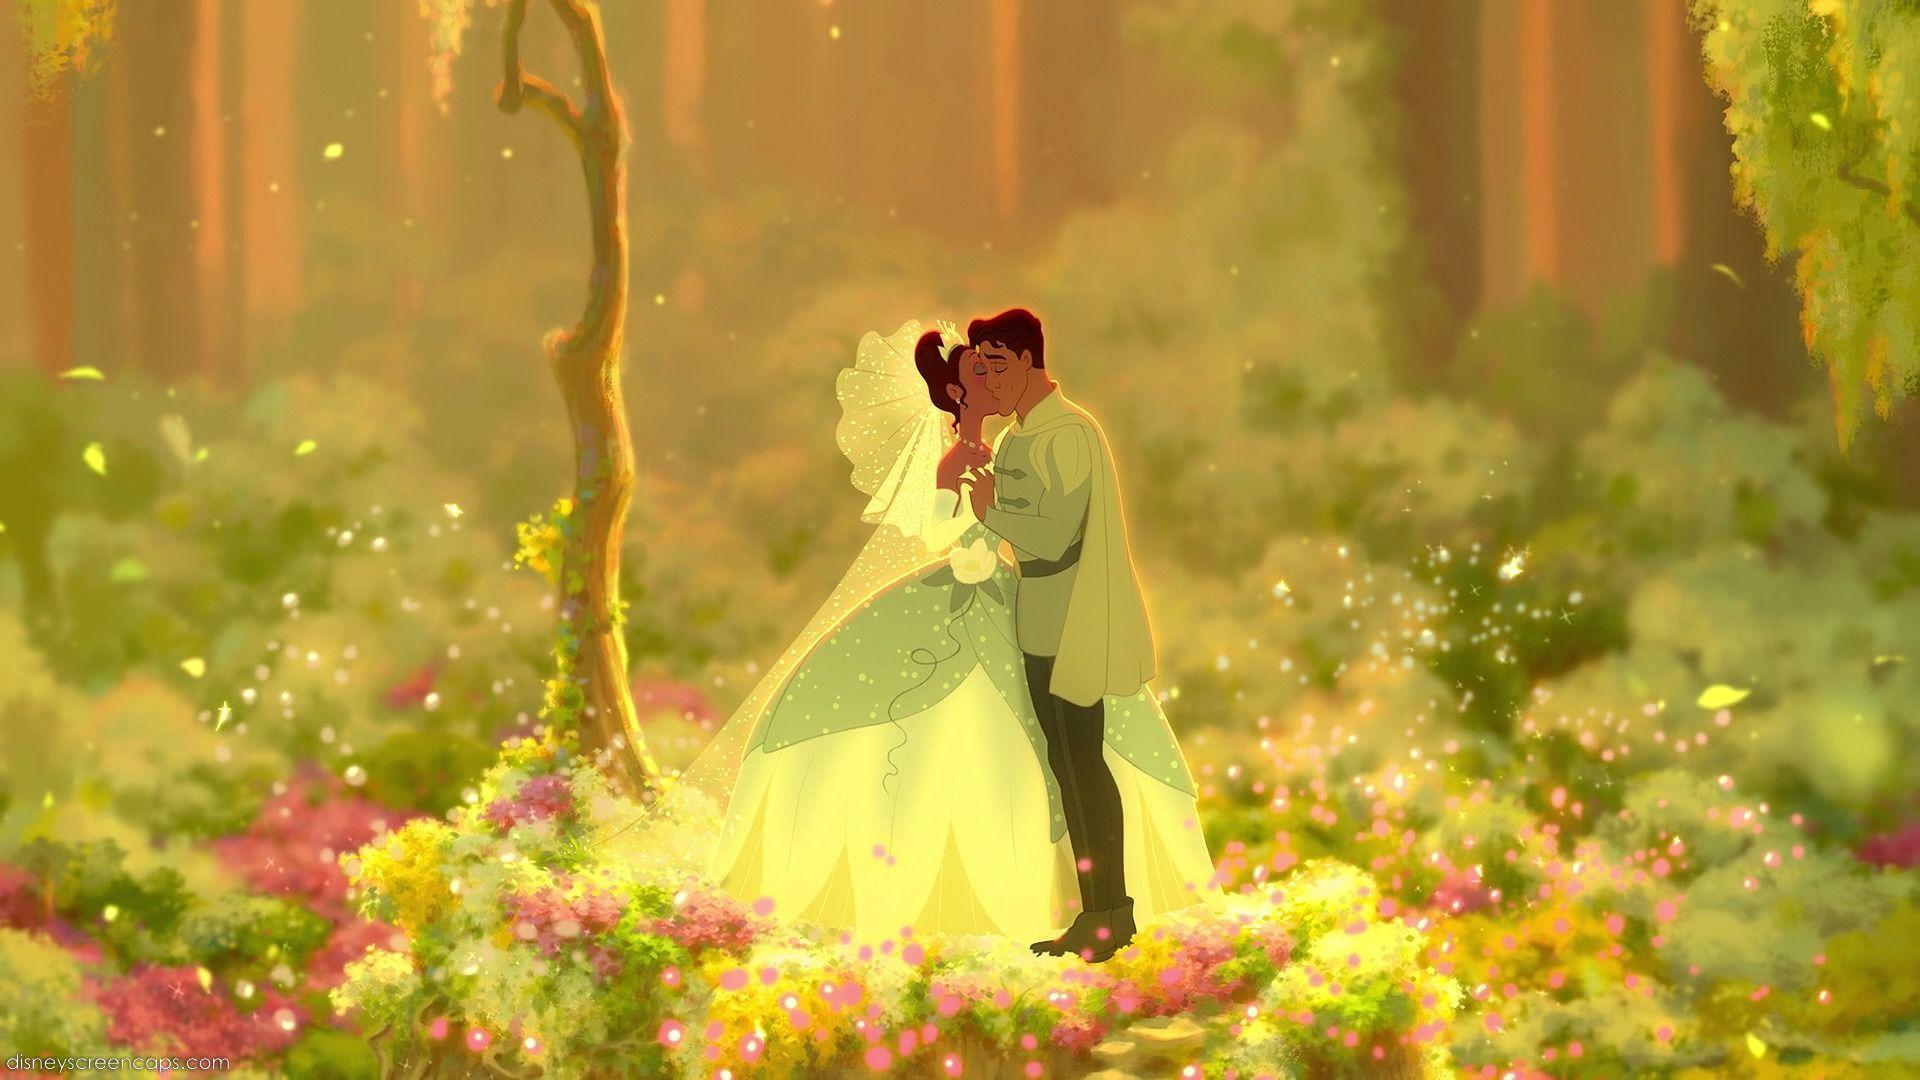 Prince Princess Kissing Hd Wallpaper Slubne Suknie Info